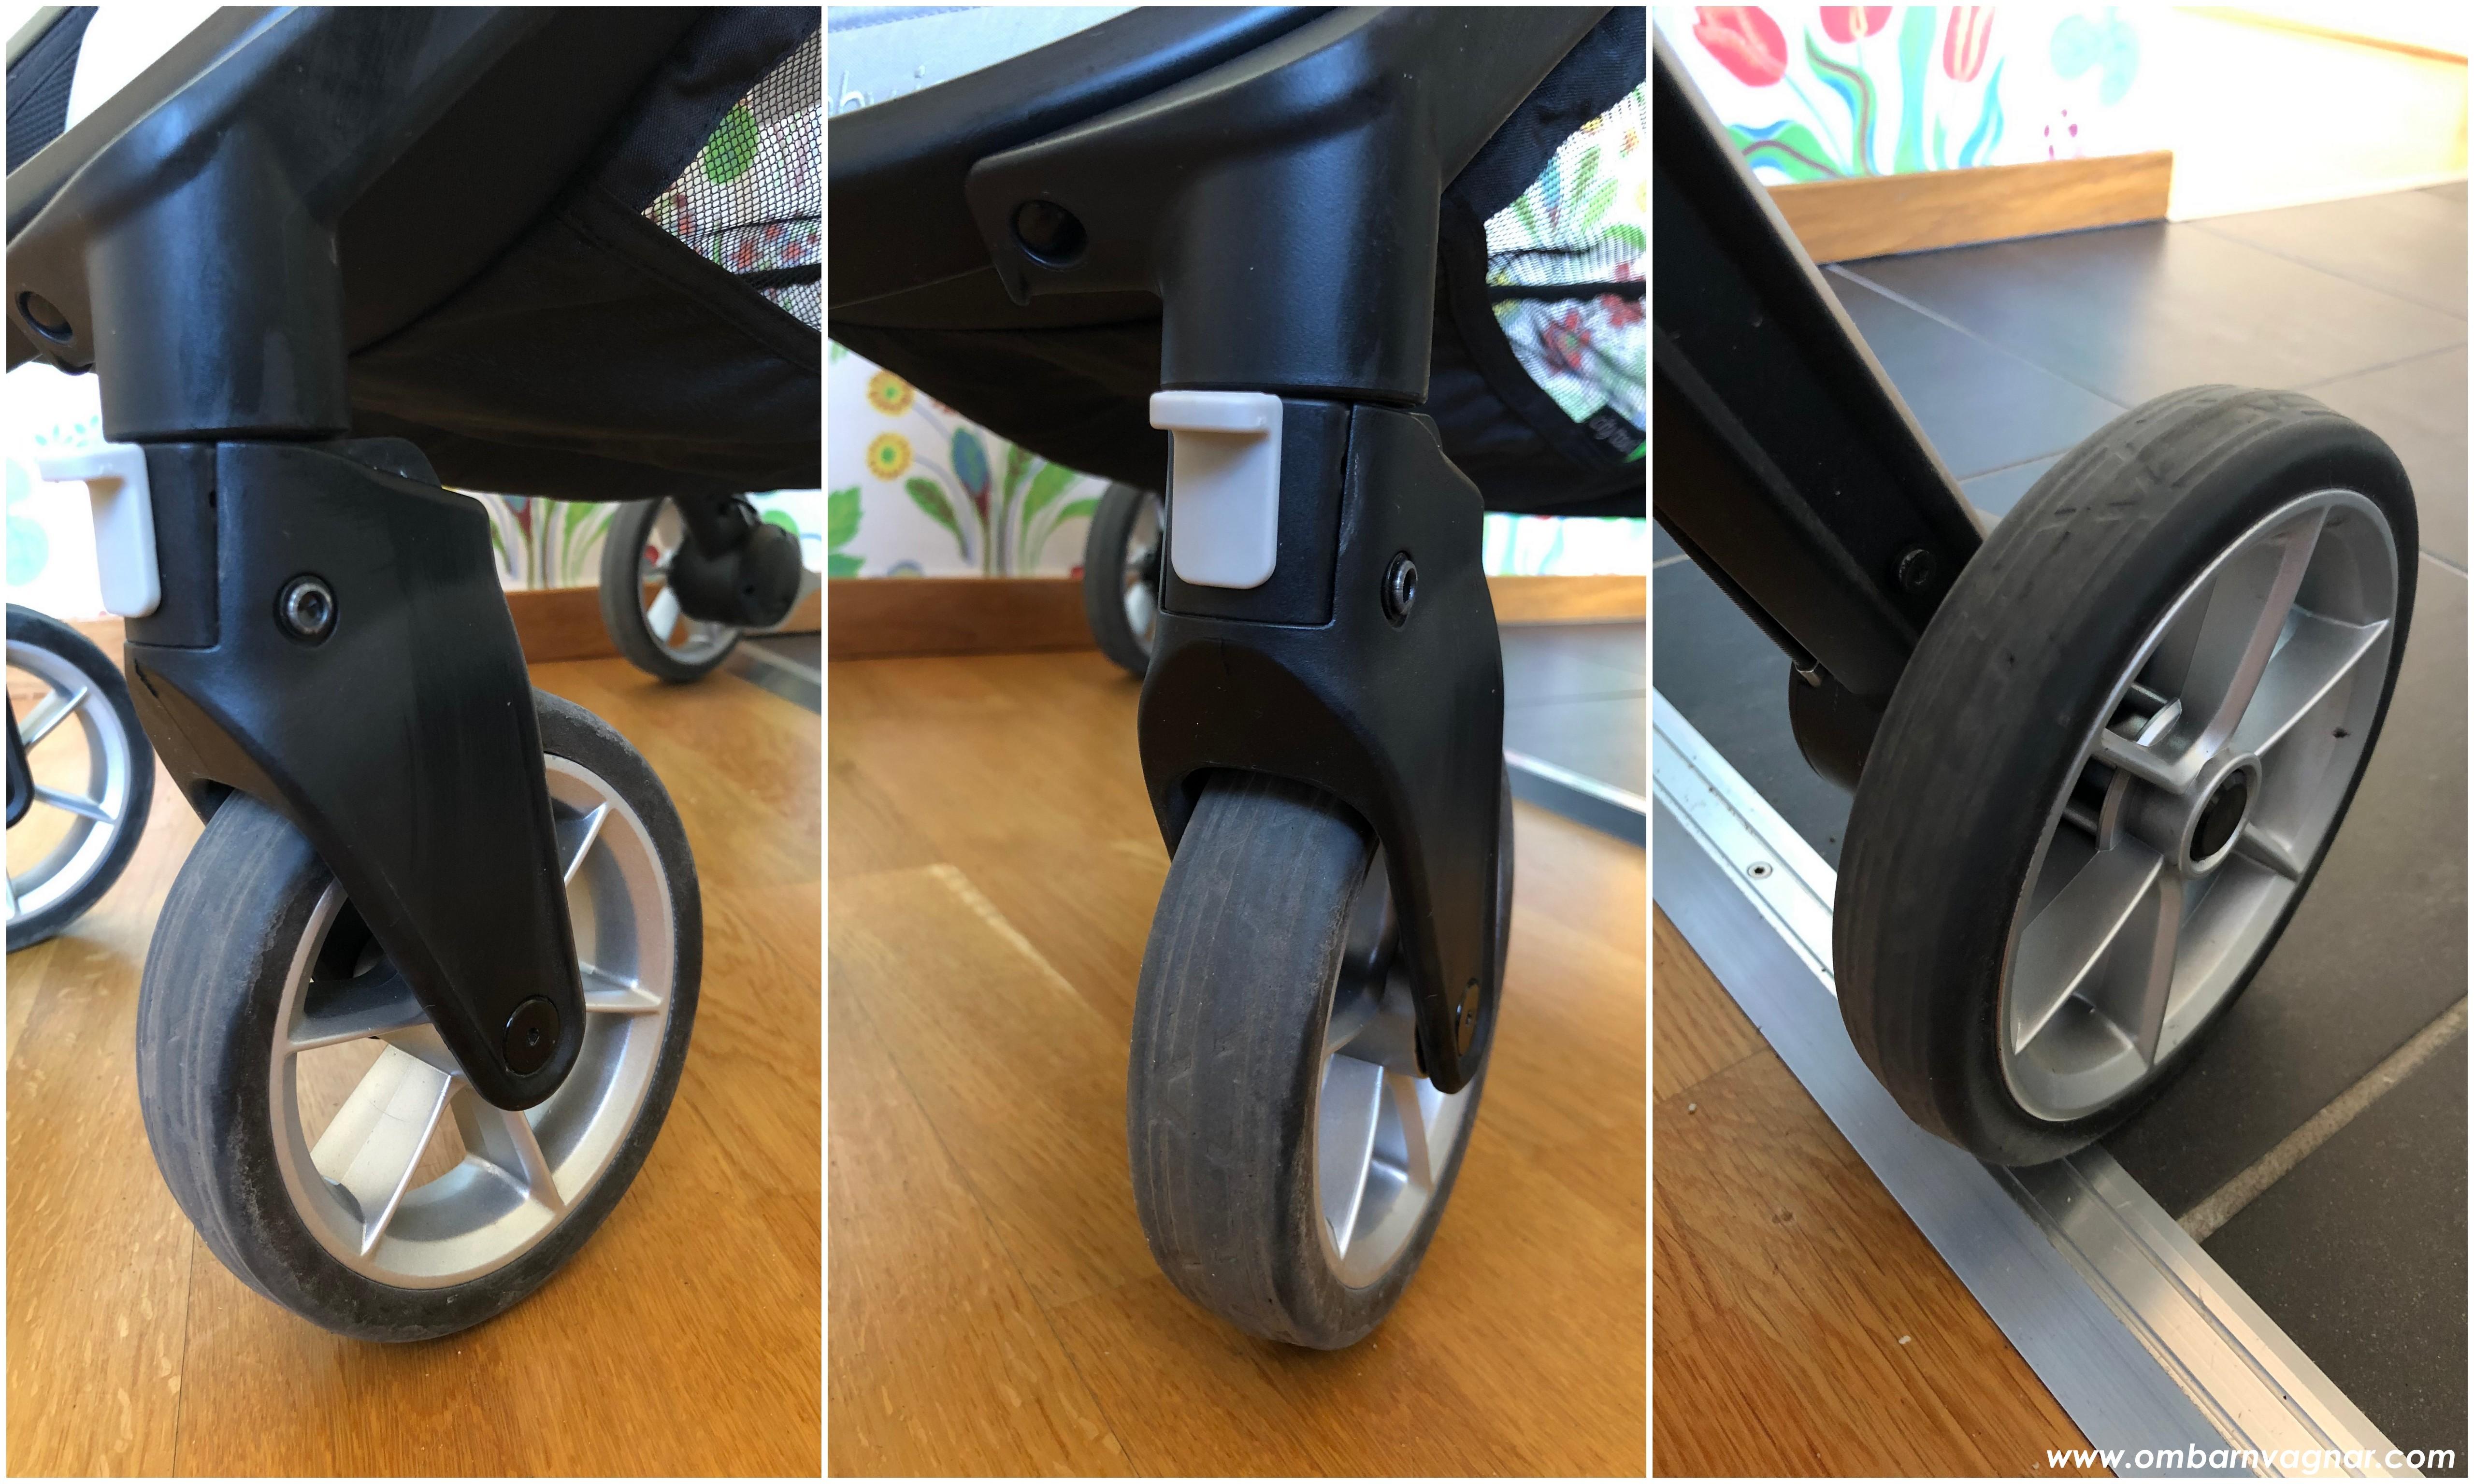 Baby Jogger City Tour 2 hjul som inte äter grus